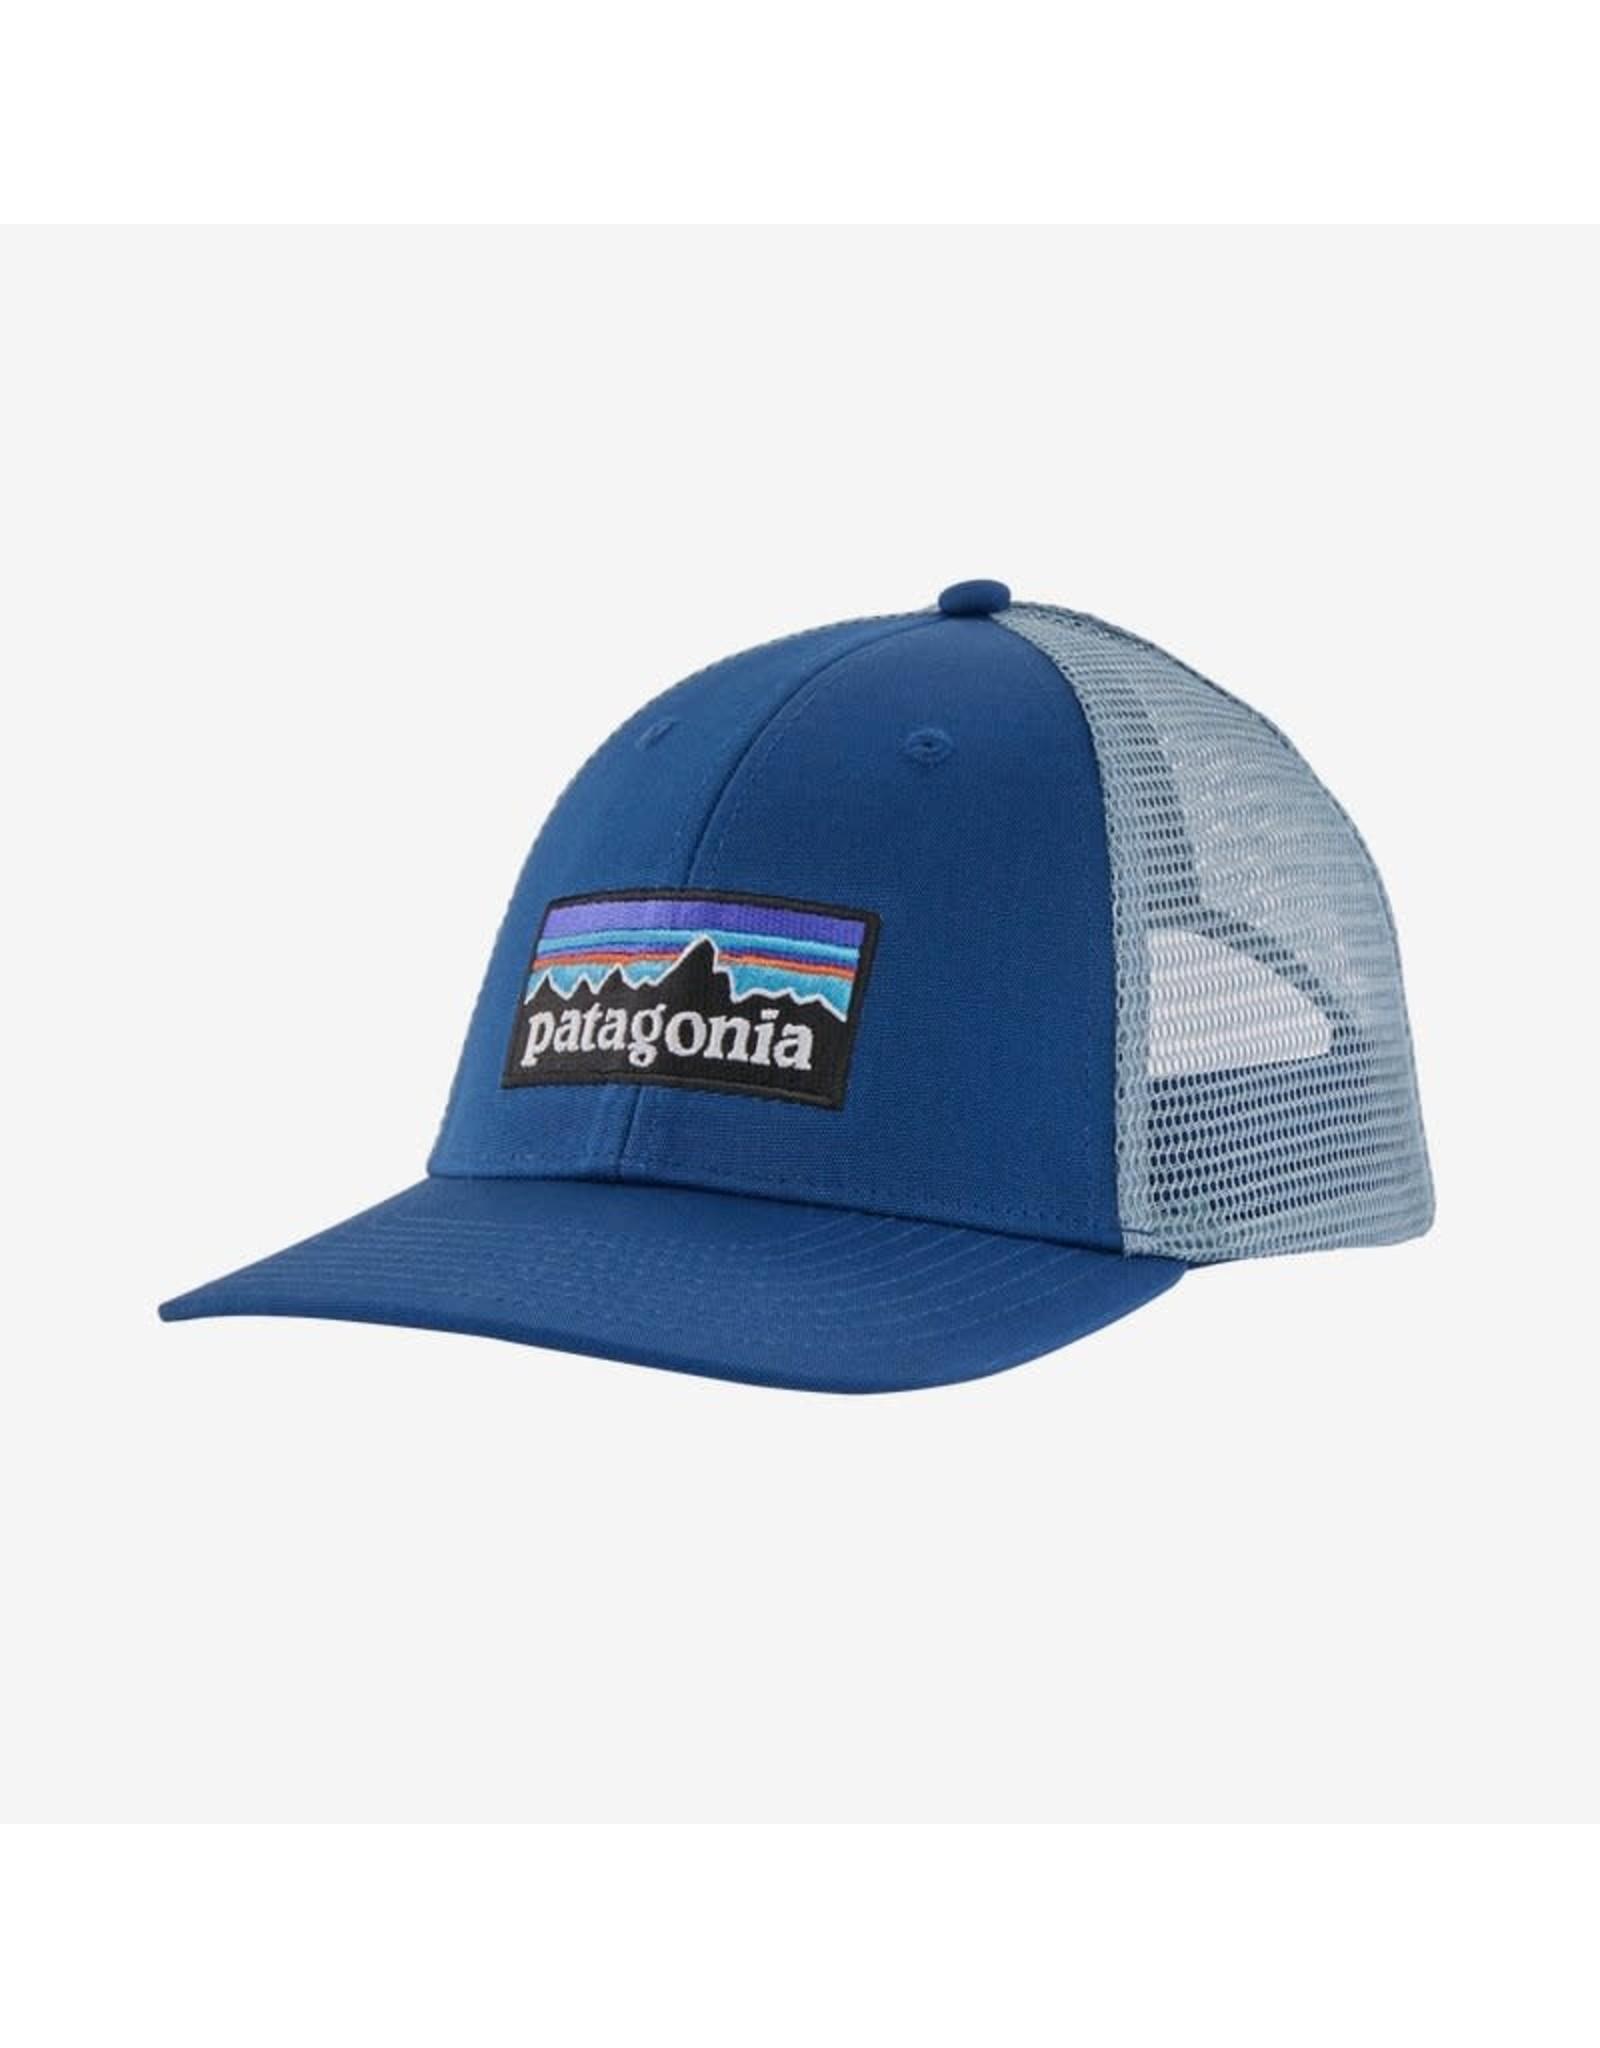 Patagonia Patagonia - Casquette homme p-6 logo lopro superior blue